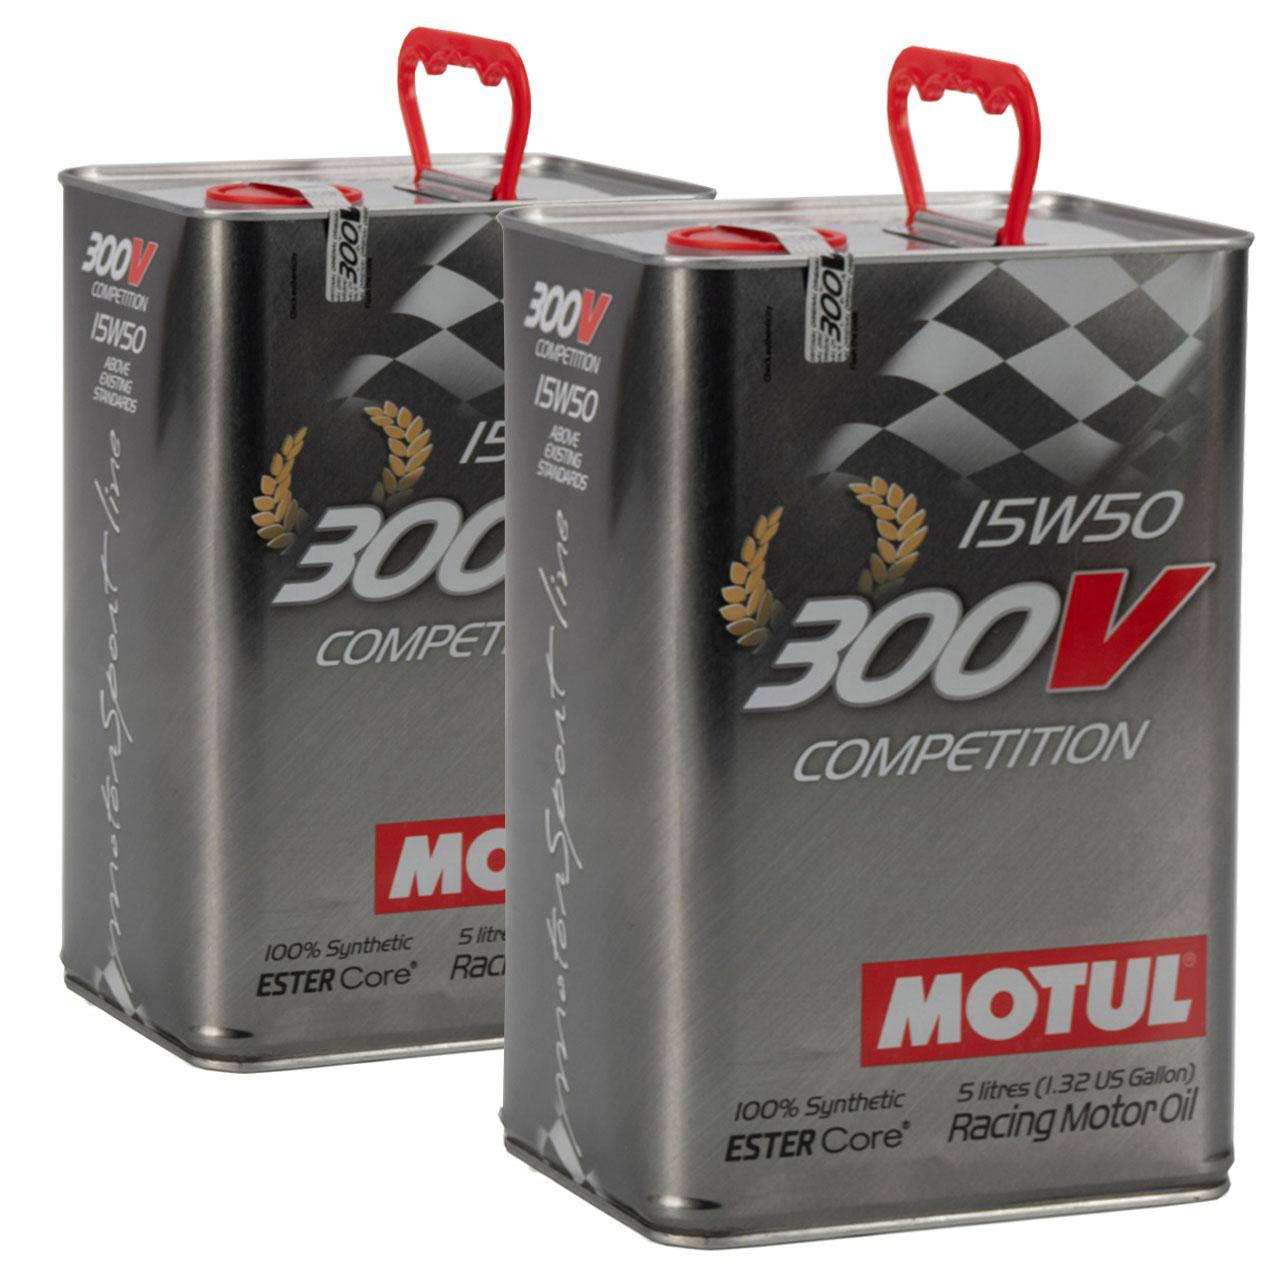 MOTUL 300 V Competition ESTER Core RACING Motoröl Öl 15W-50 15W50 - 10L 10 Liter